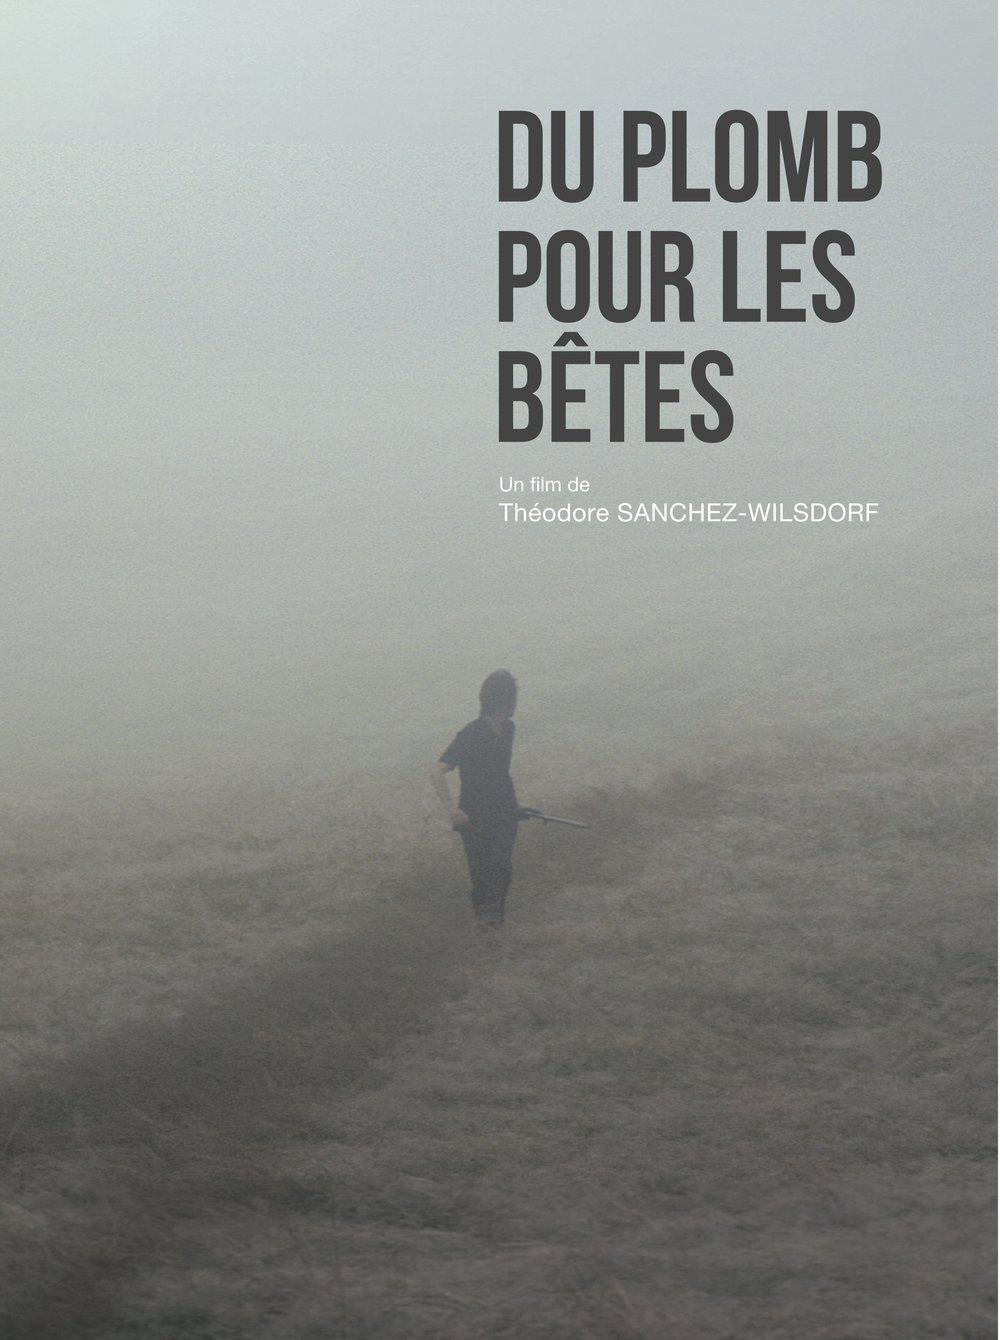 SHORT Director Théodore Sanchez-Wilsdorf  DOP  Florian Berutti  Production  Les Films du Périscope  Editing:  Paul Millot   2017